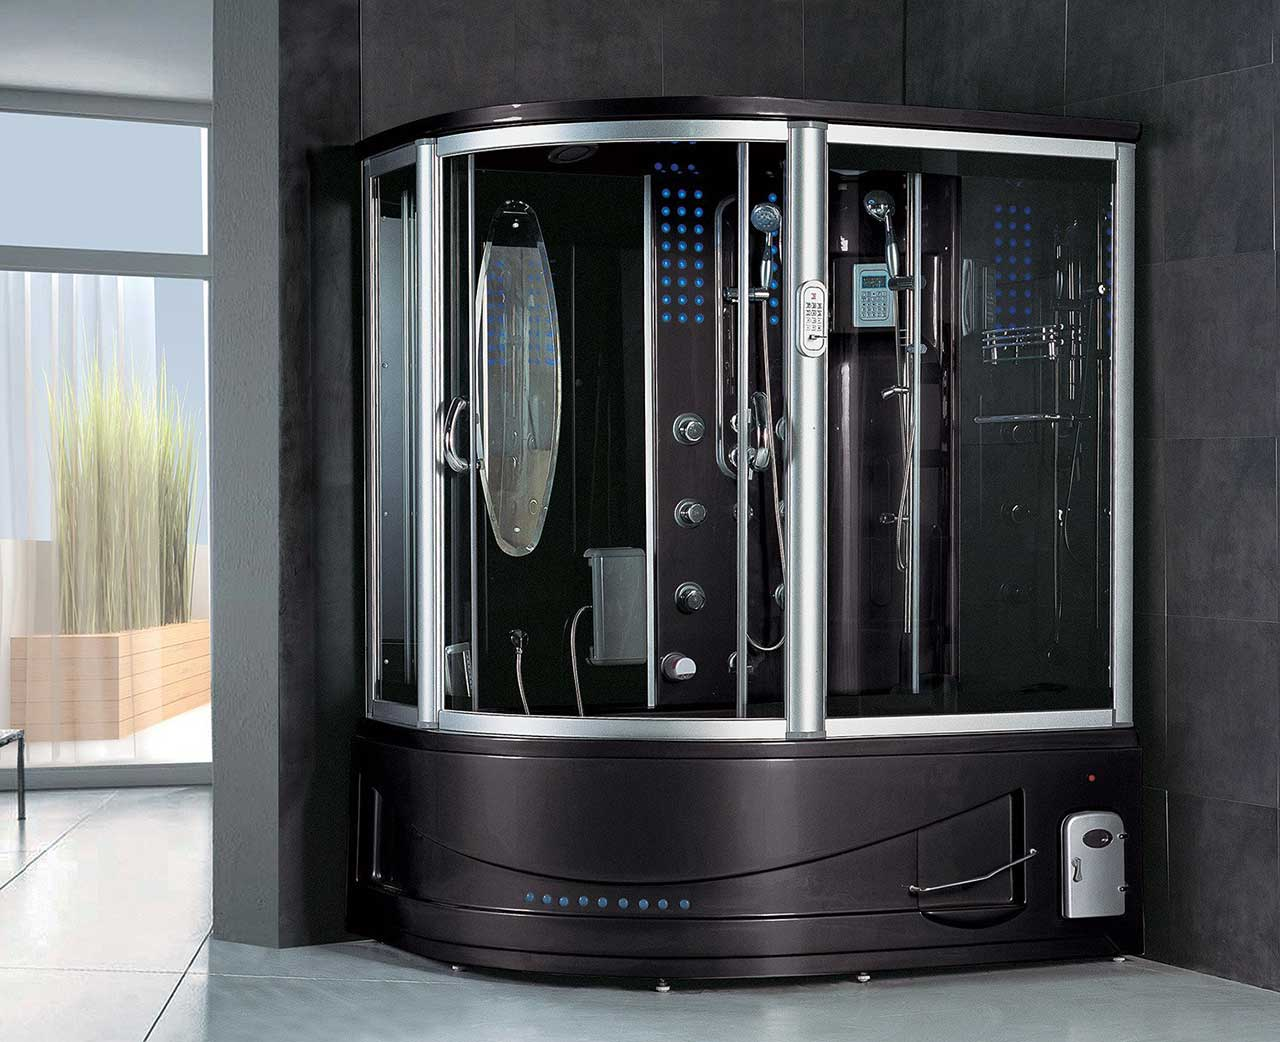 Siena Computerized Steam Shower Sauna with Jetted jacuzzi Whirlpool Massage Bathtub Spa